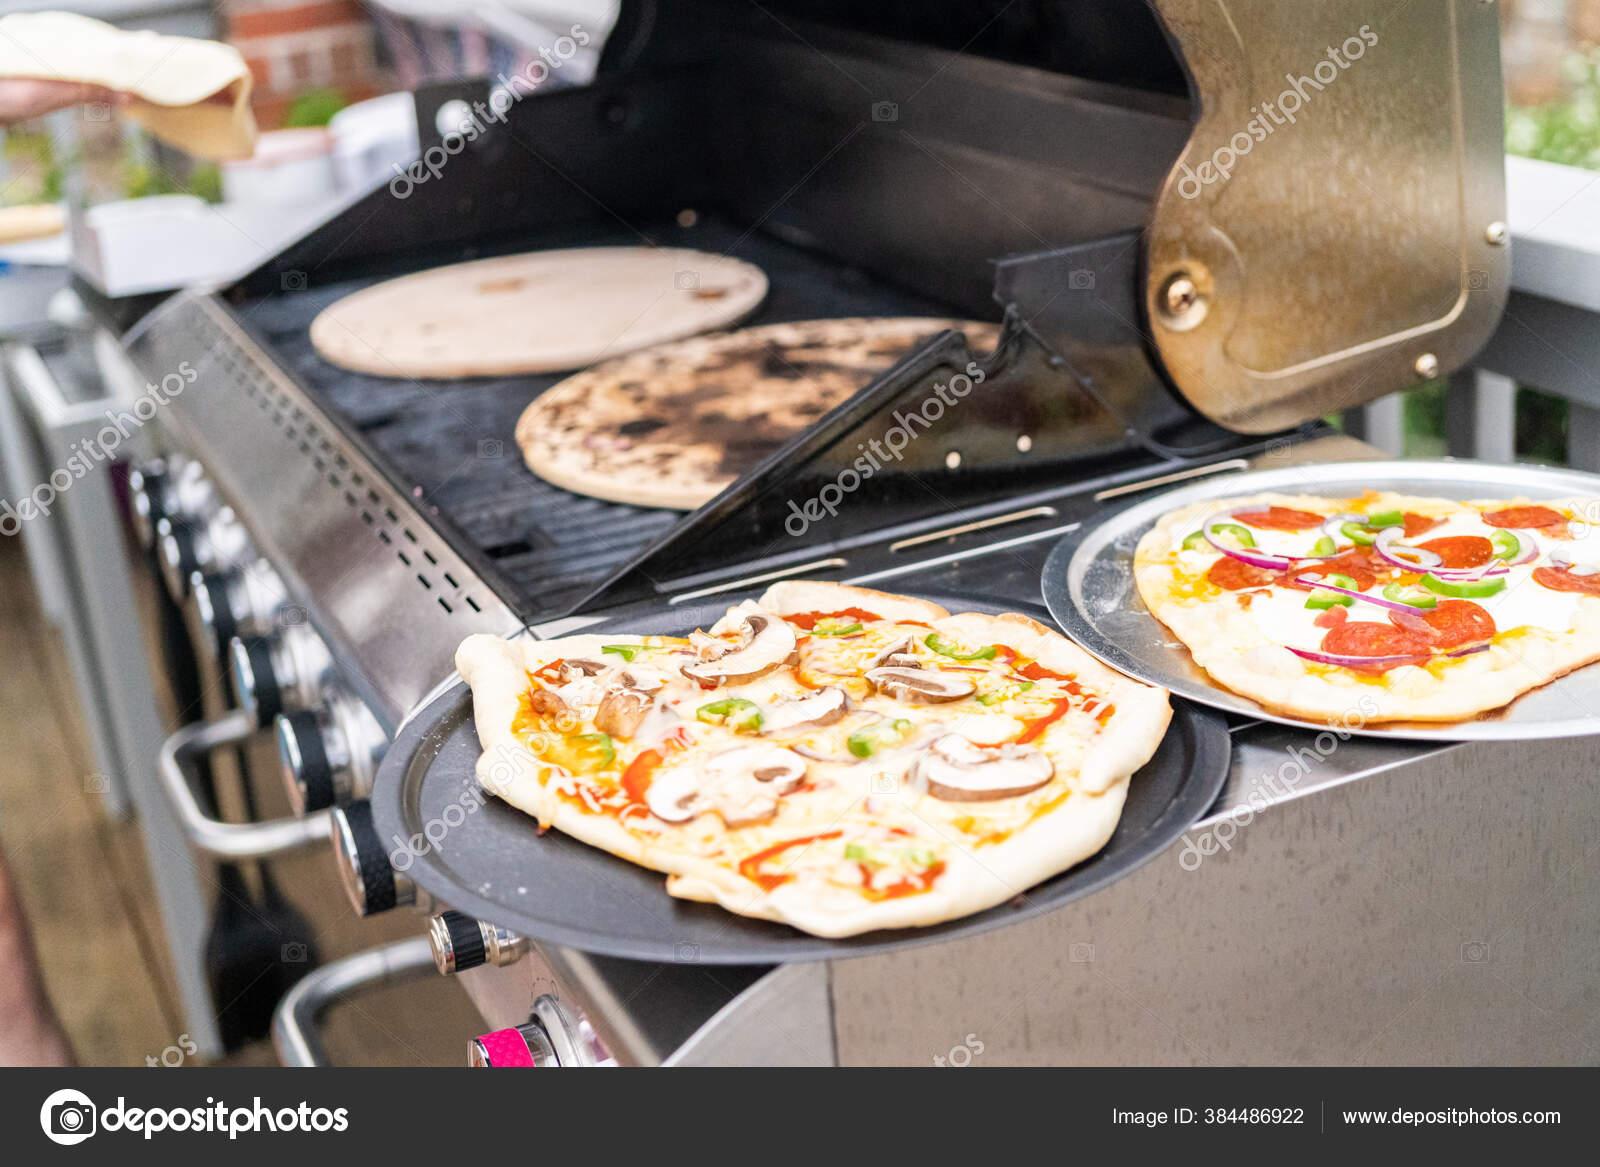 Menyiapkan Pizza Yang Dipanggang Secara Individual Atas Panggangan Gas Luar Stok Foto C Urban Light 384486922